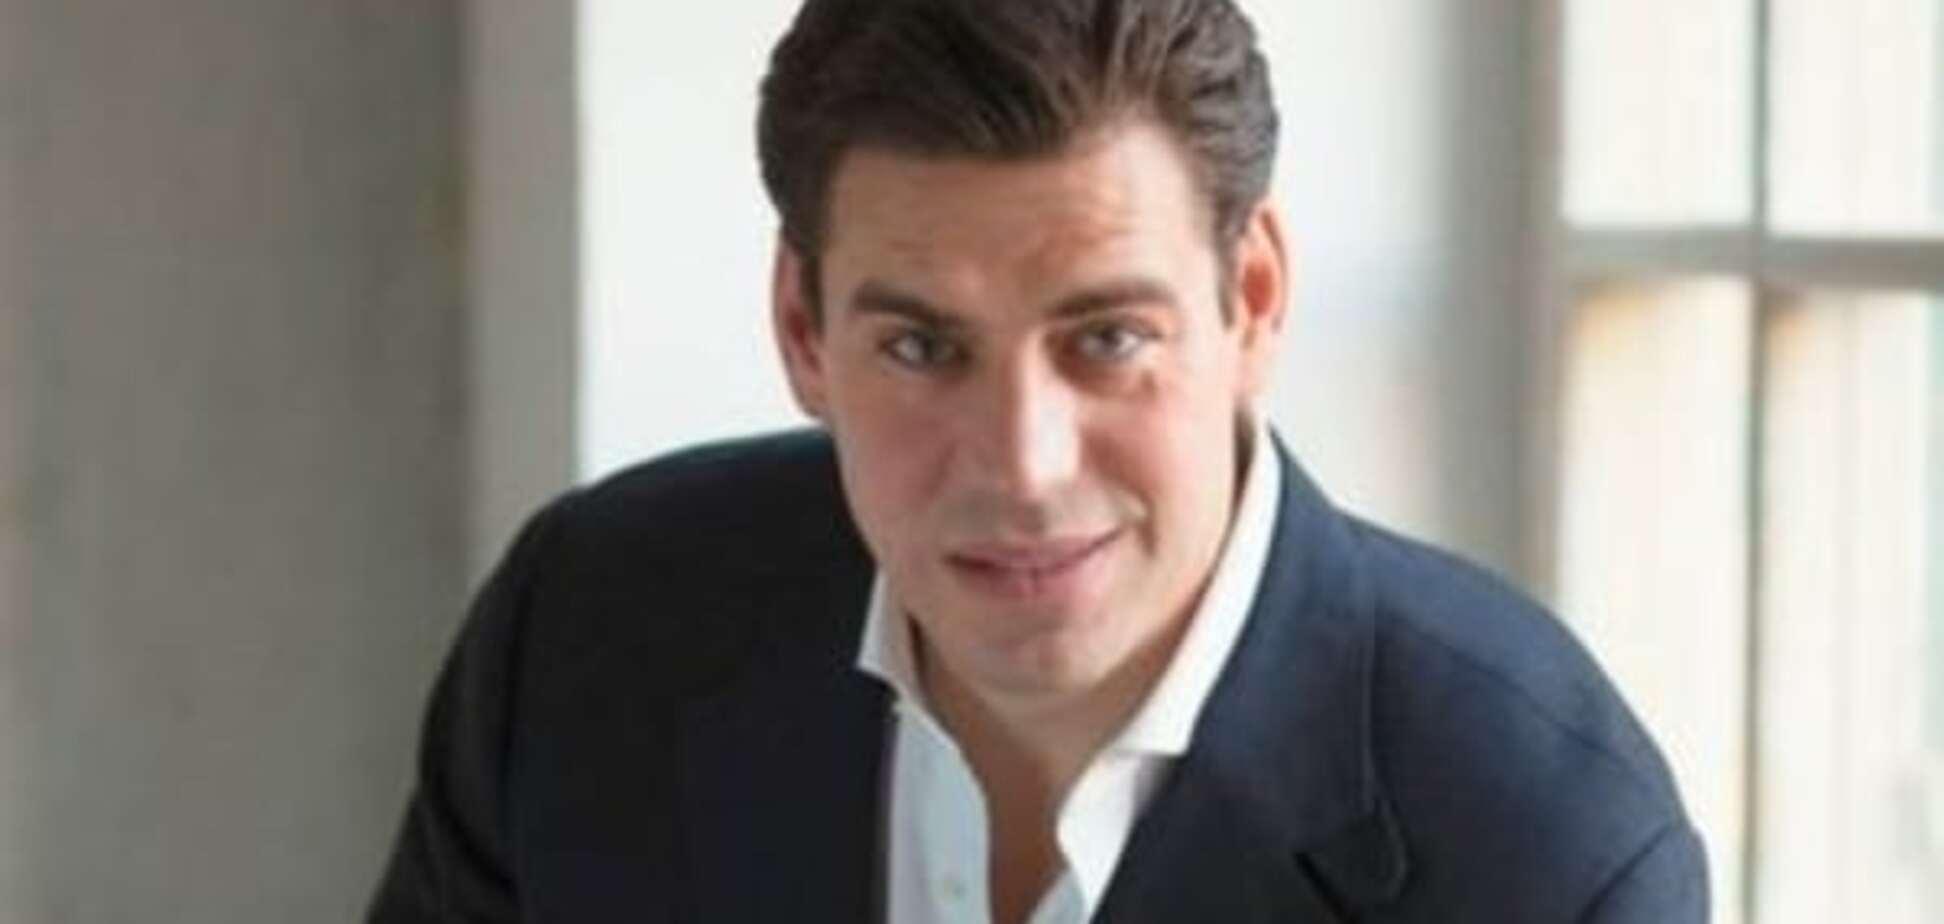 Российский актер устроил троллинг звезде Голливуда